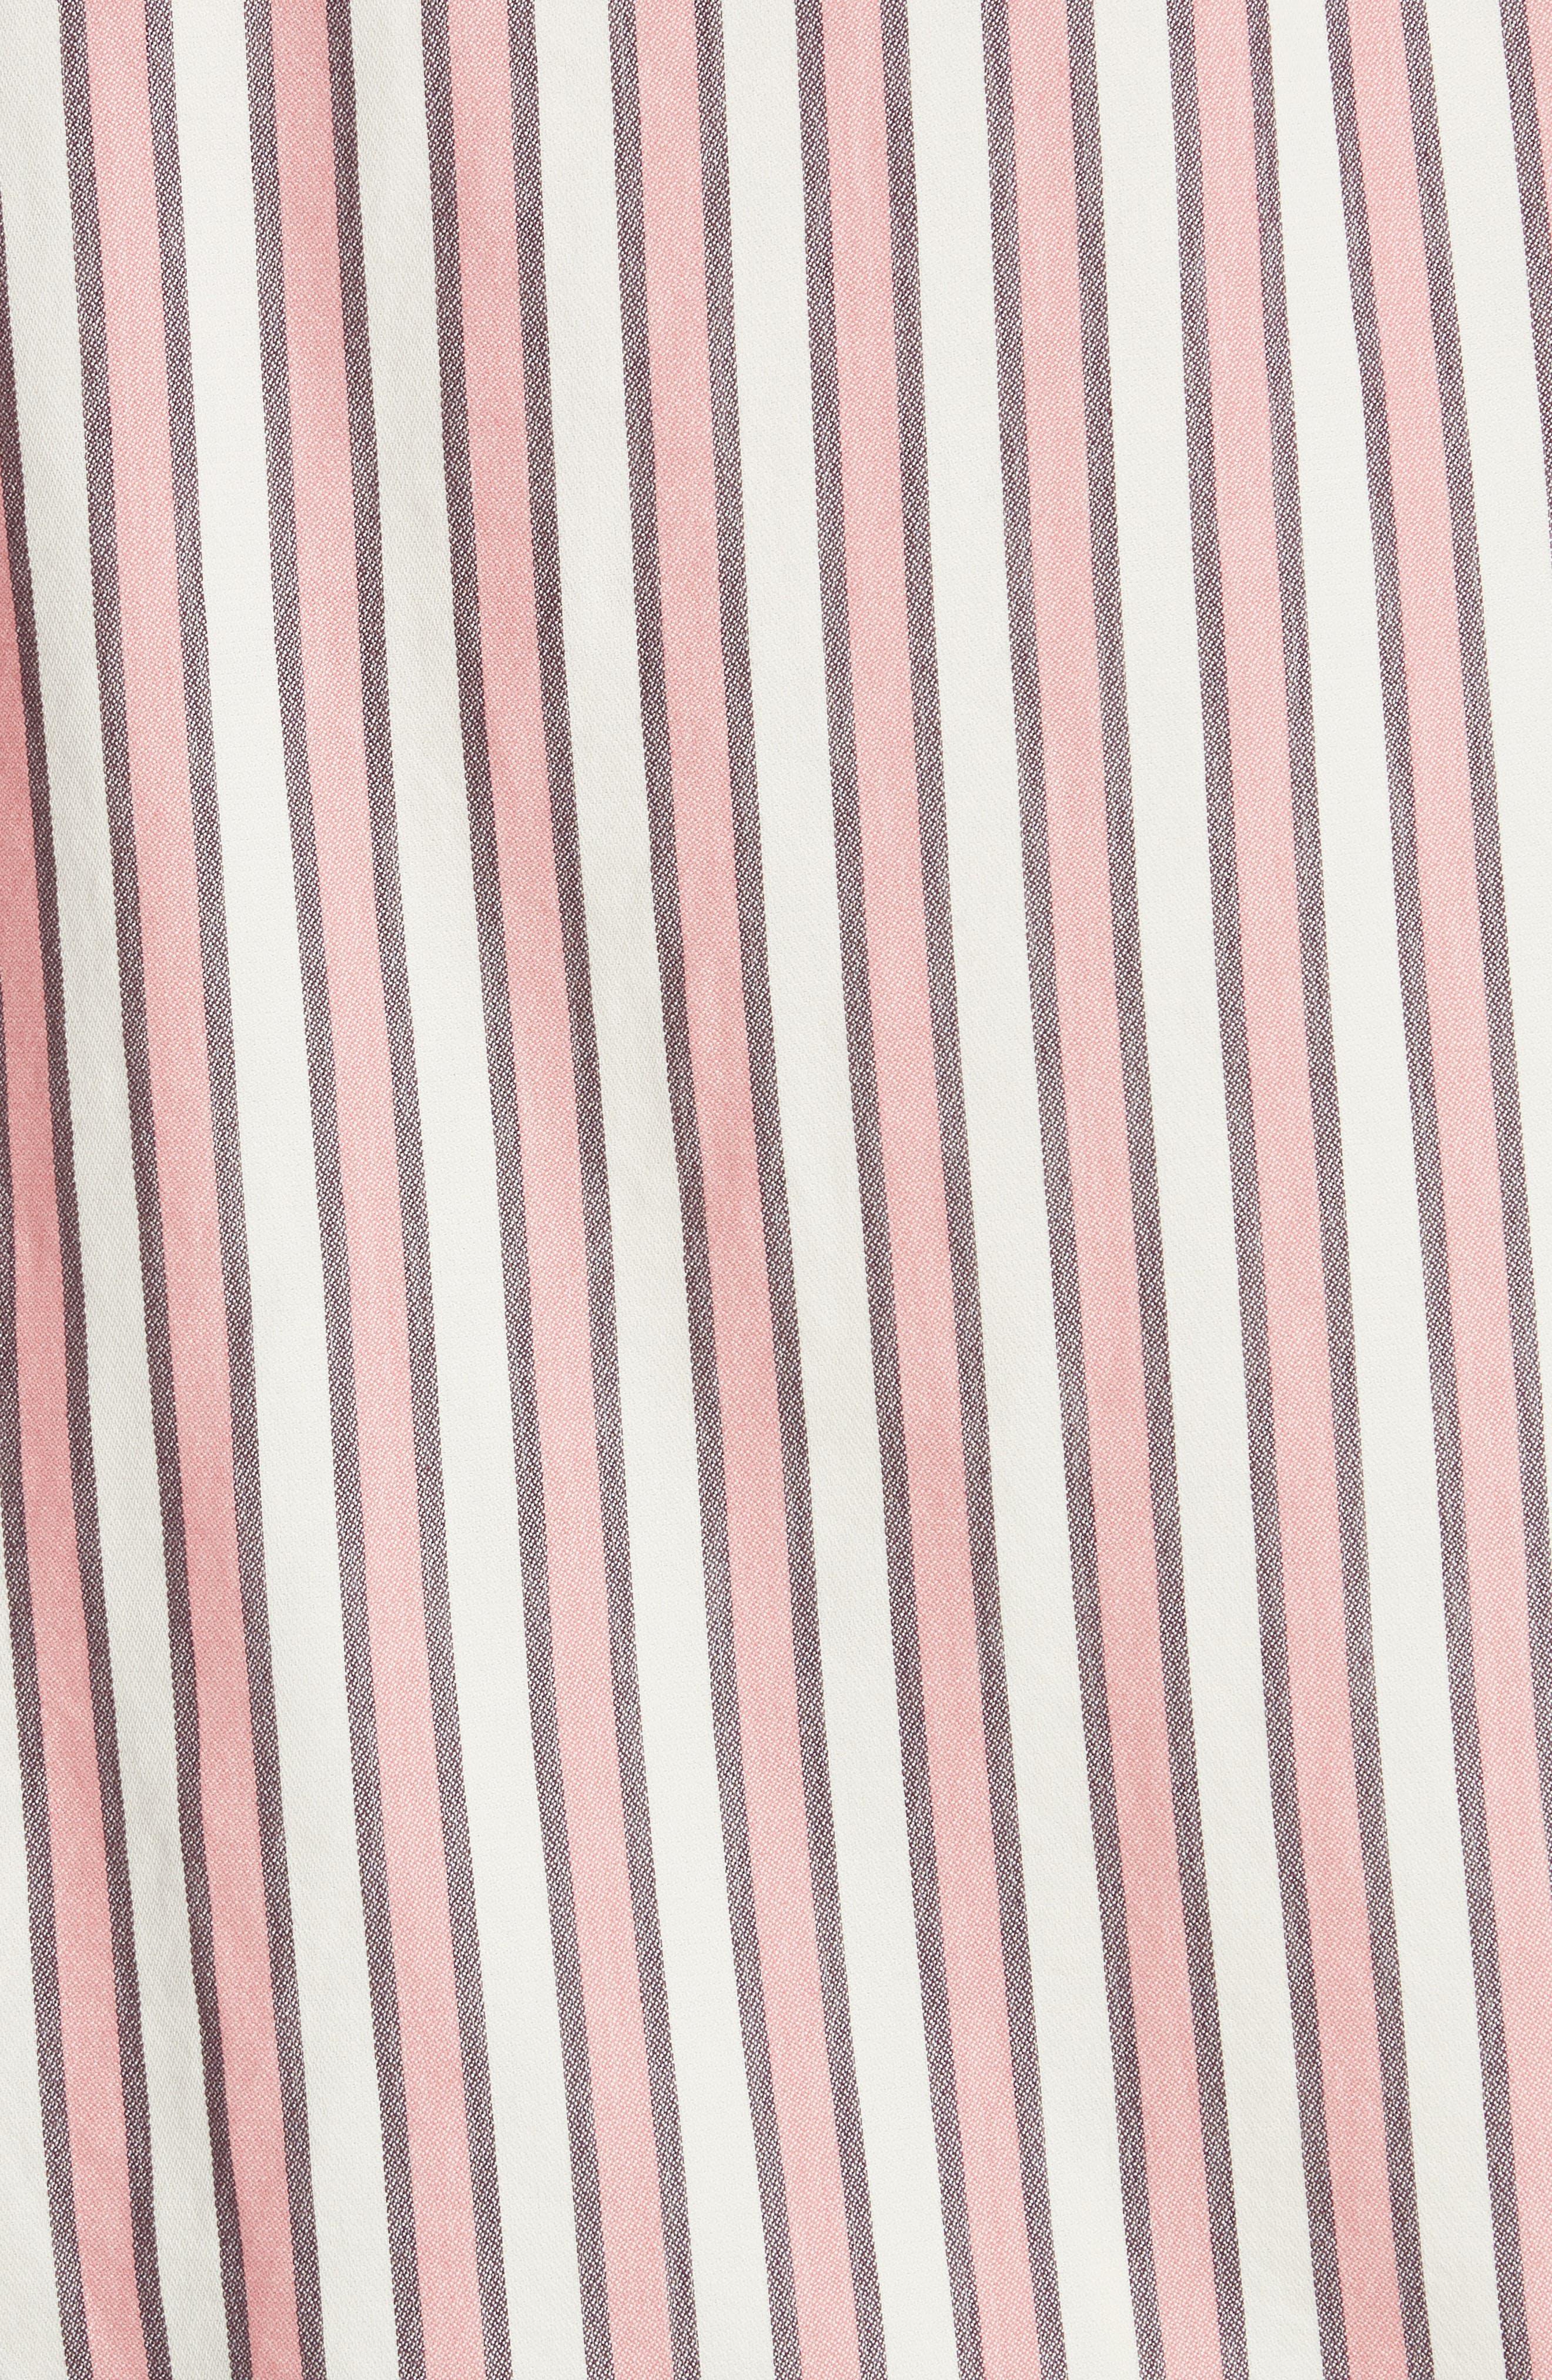 Flutter Sleeve Stripe Shirt,                             Alternate thumbnail 6, color,                             Pink Taffy Stripe